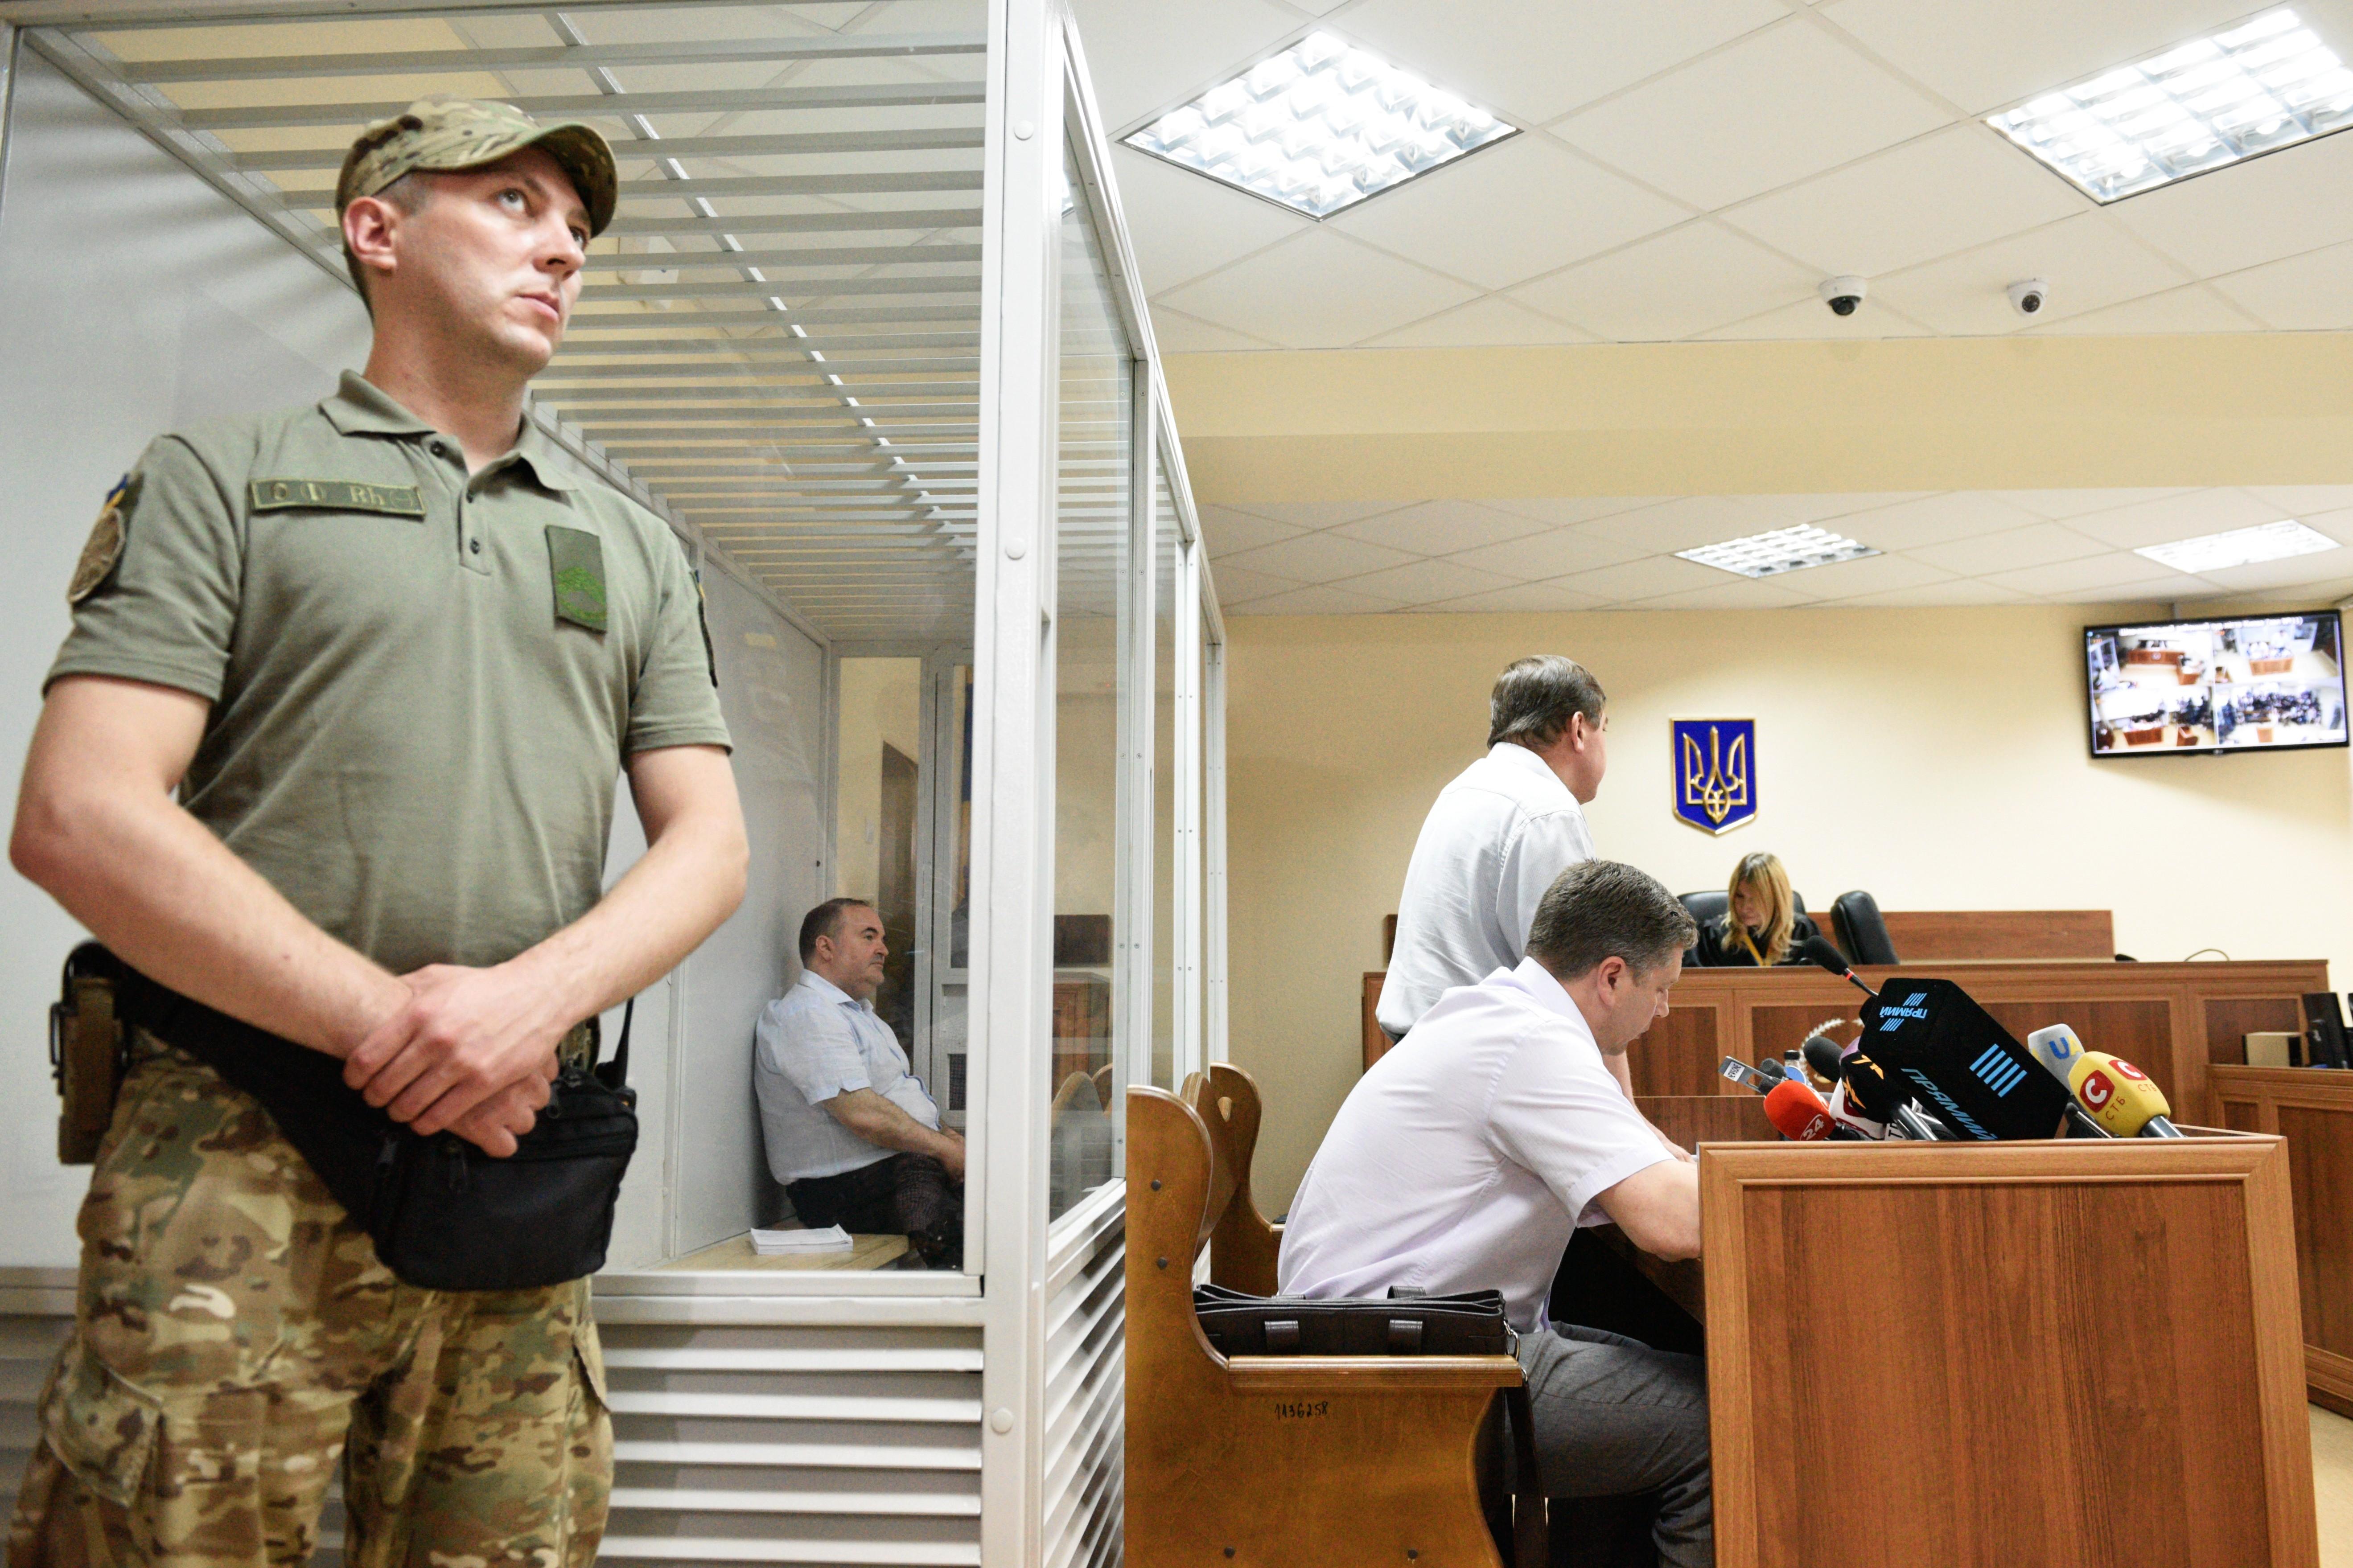 <p><span>Фото: &copy;РИА Новости/Стрингер</span></p>